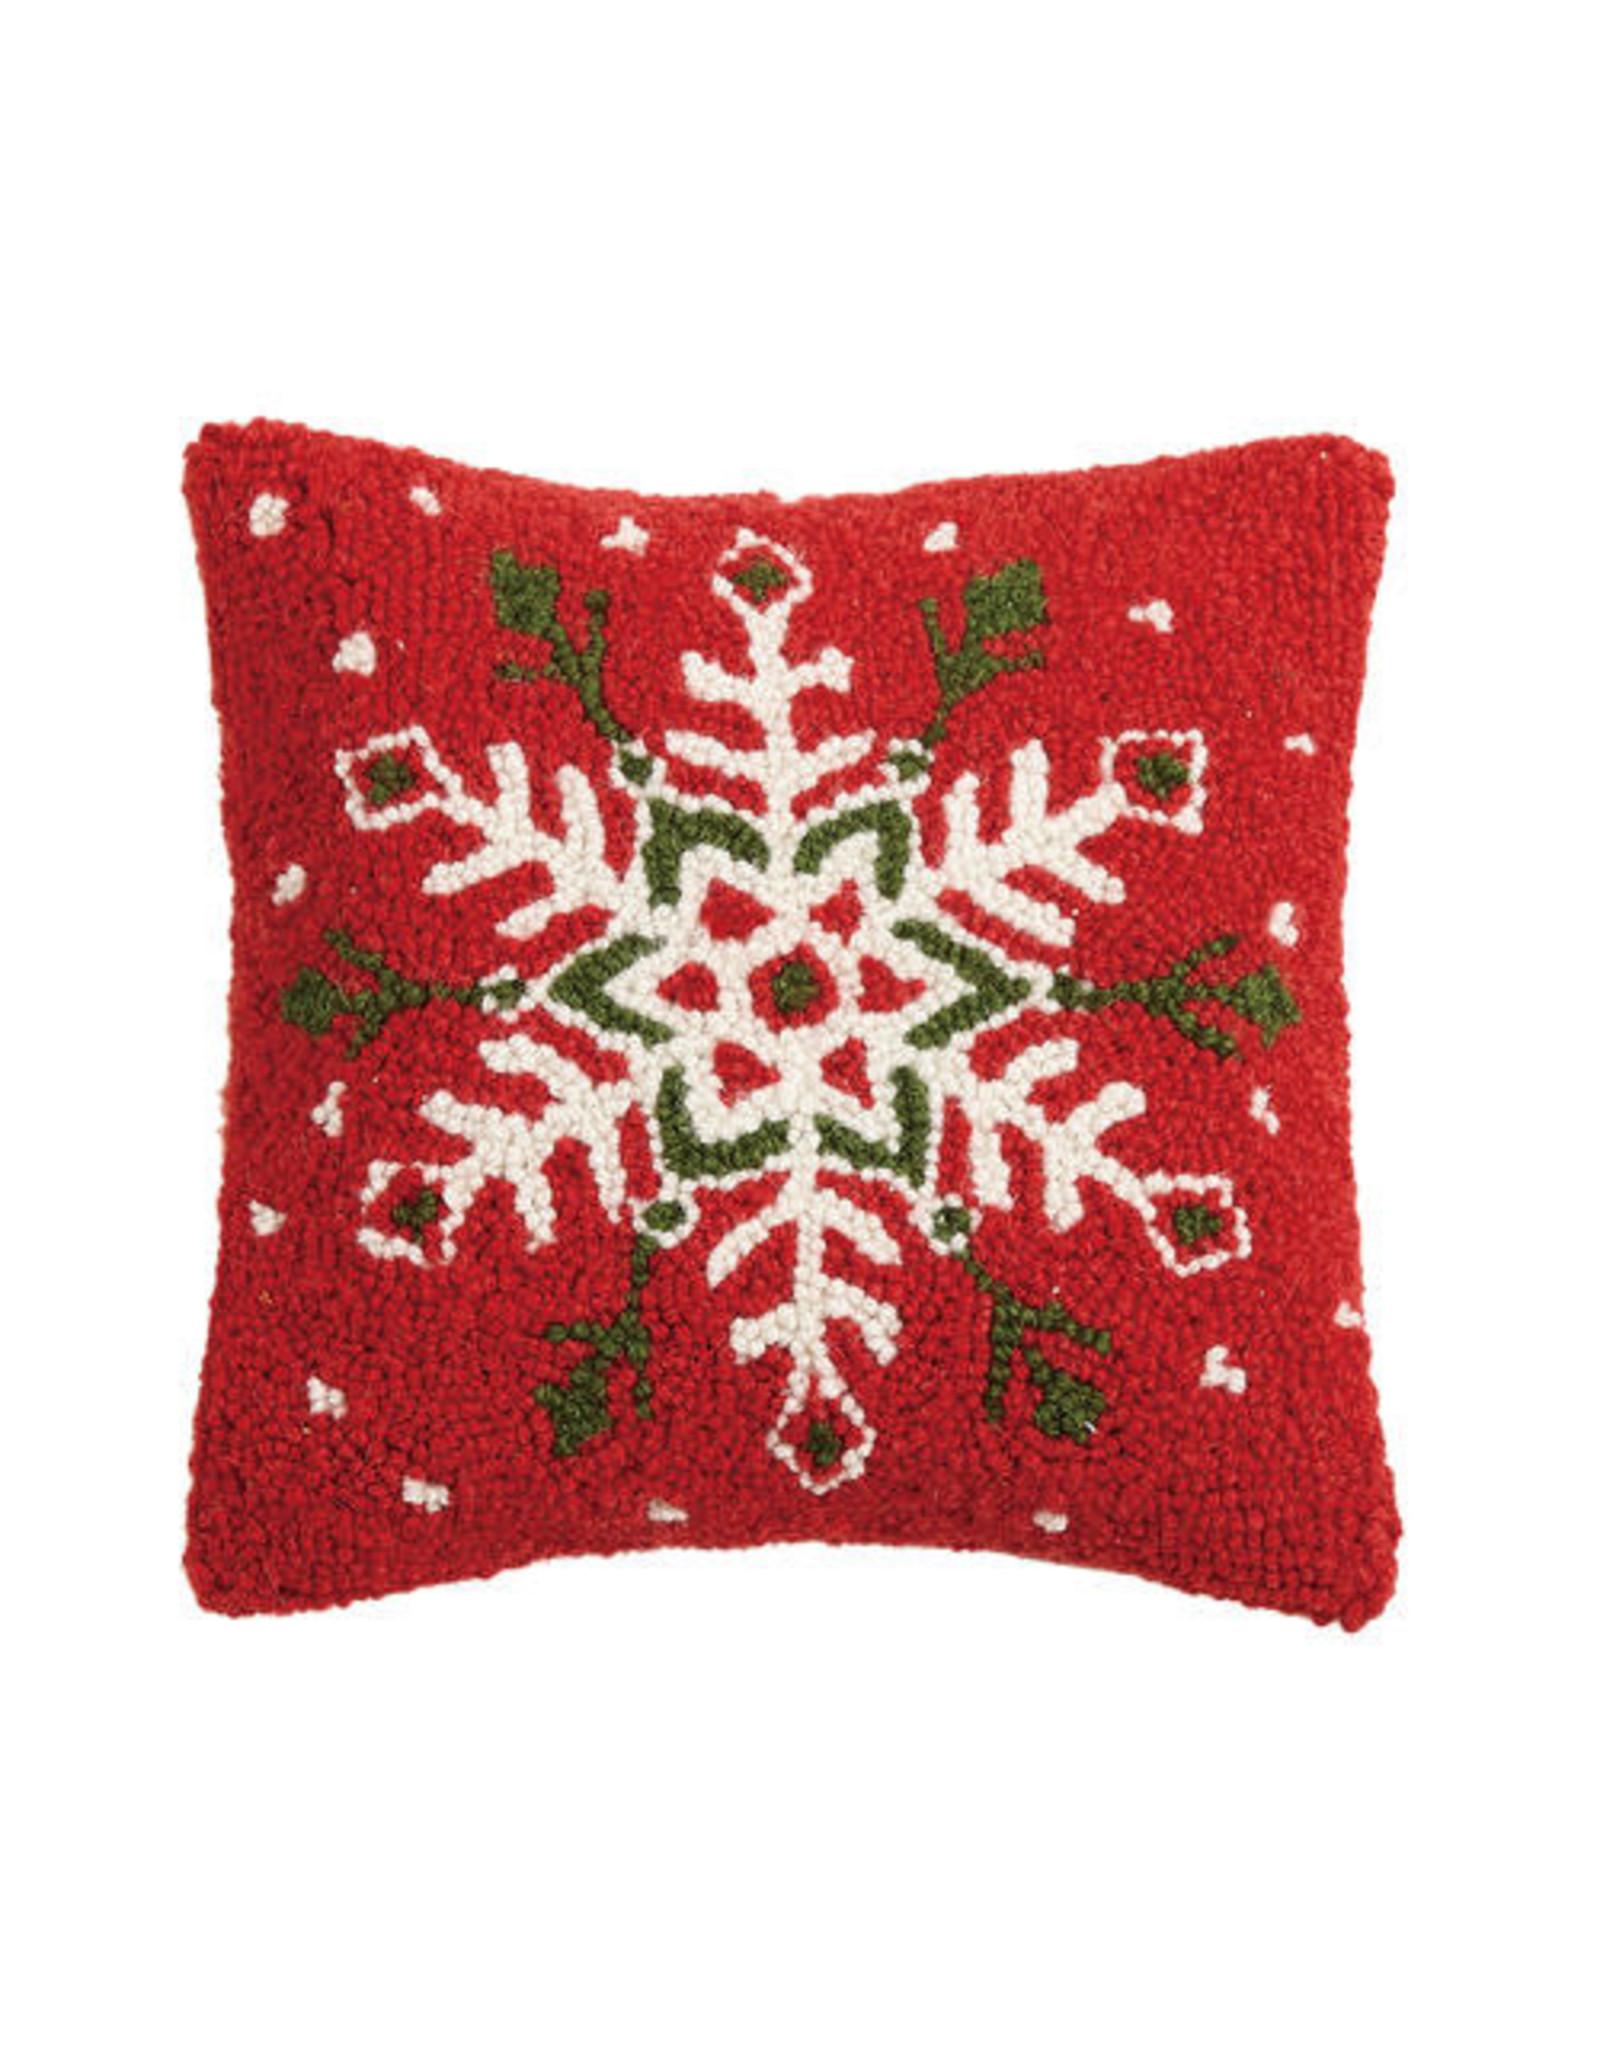 Festive Snowflake Hooked Pillow